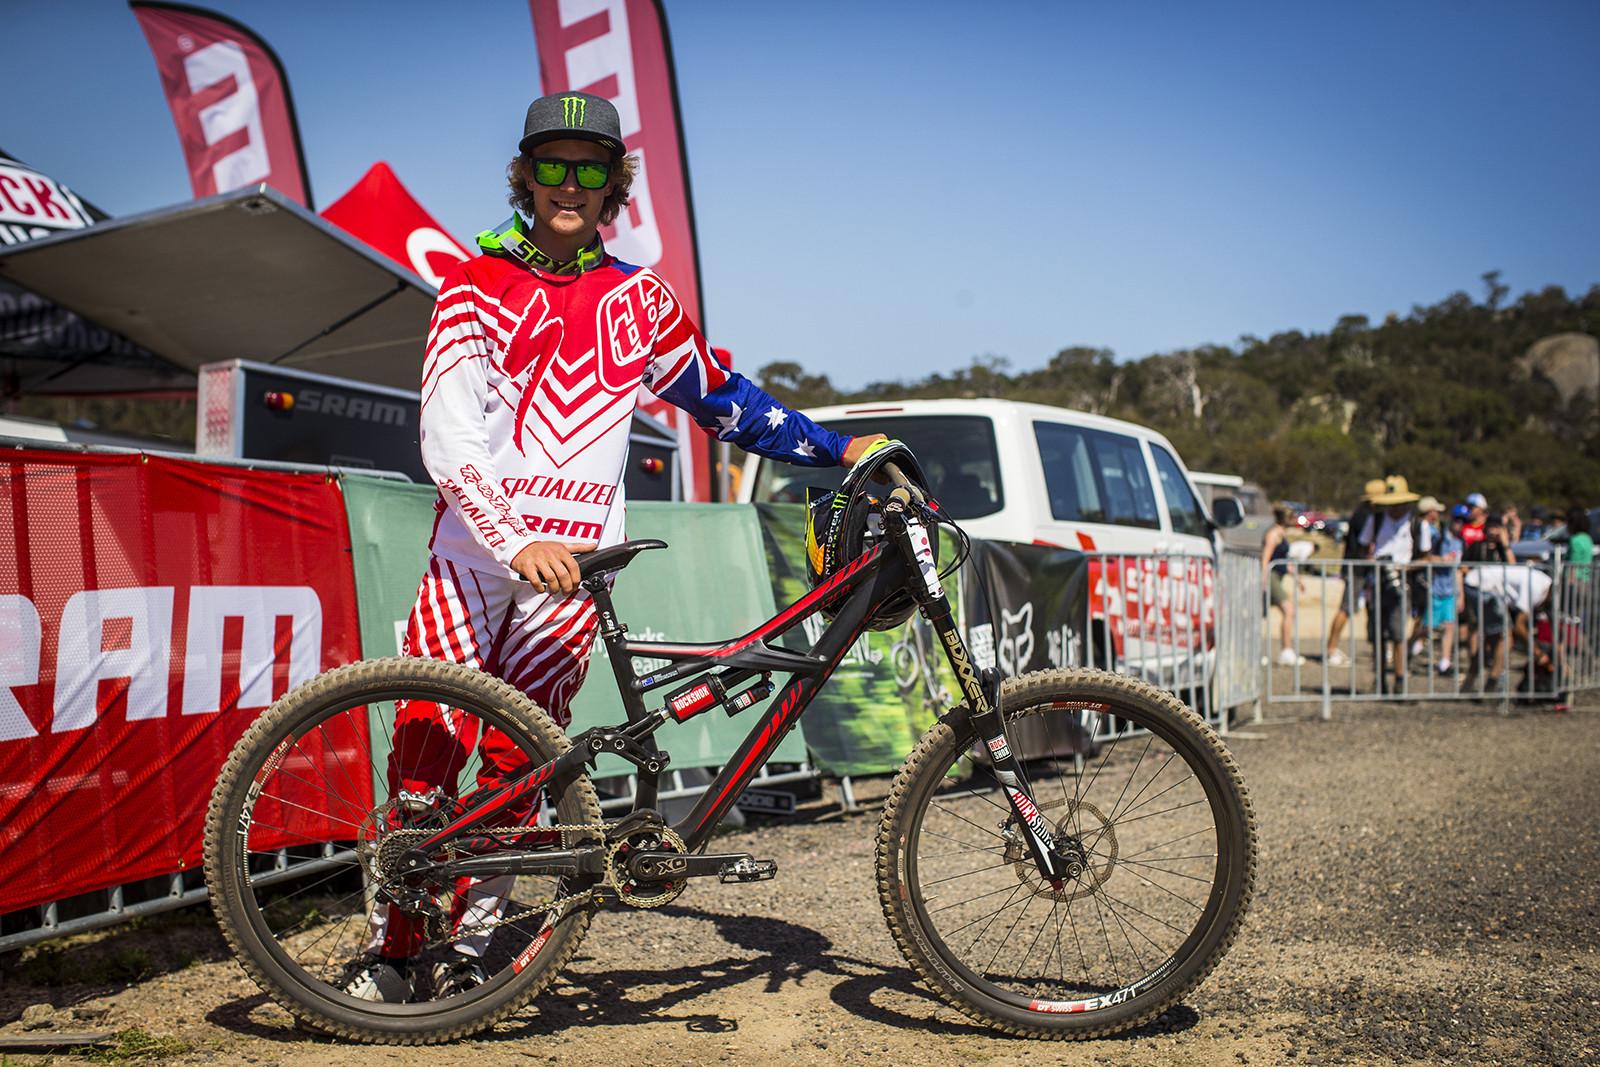 WINNING BIKE: Troy Brosnan's Specialized Enduro Expert EVO - WINNING BIKE: Troy Brosnan's Specialized Enduro Expert EVO - Mountain Biking Pictures - Vital MTB